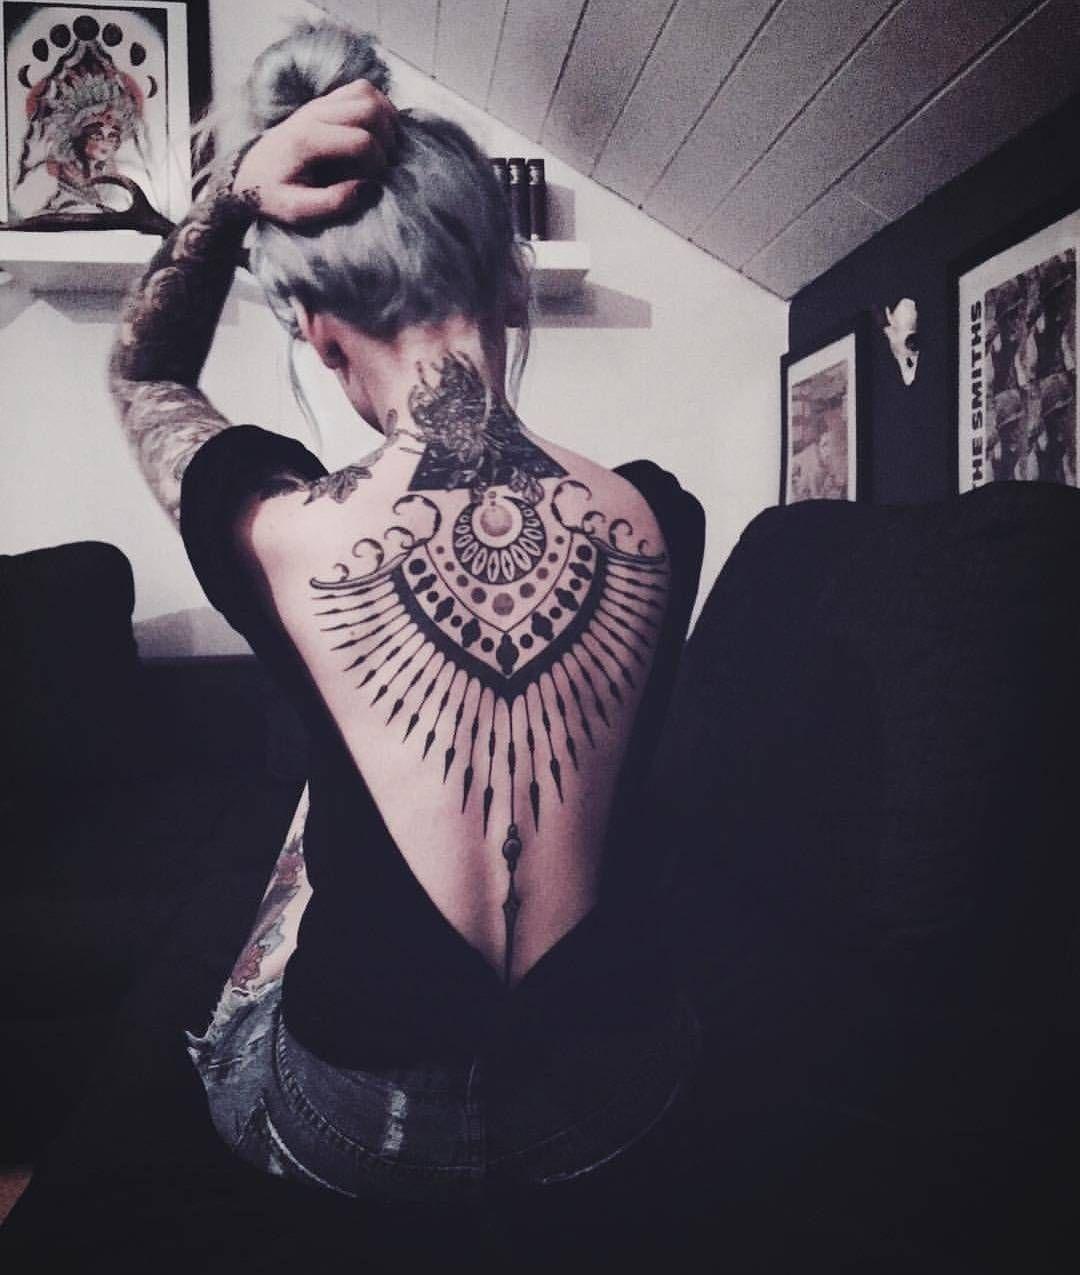 "Tattoos and Artists on Instagram: ""©@jessicasvartvit  #tattoo #ink #tattoos #inked #art #tattooartist #tattooed #girlswithtattoos #tattooart #tattoolife #tattooflash #bodyart…"" - Tattoos and Artists on Instagram: ""©@jessicasvartvit  #tattoo #ink #tattoos #inked #art #tattooar - #abstractbodyart #africanbodyart #airbrushbodyart #Art #artofthebody #artists #bloombodyart #bodyartaesthetic #bodyartpiercing #bodyarttattoos #bodypaint #bodypaintartistnearme #bodypaintkids #bodysafepaint #bodyart #fes"